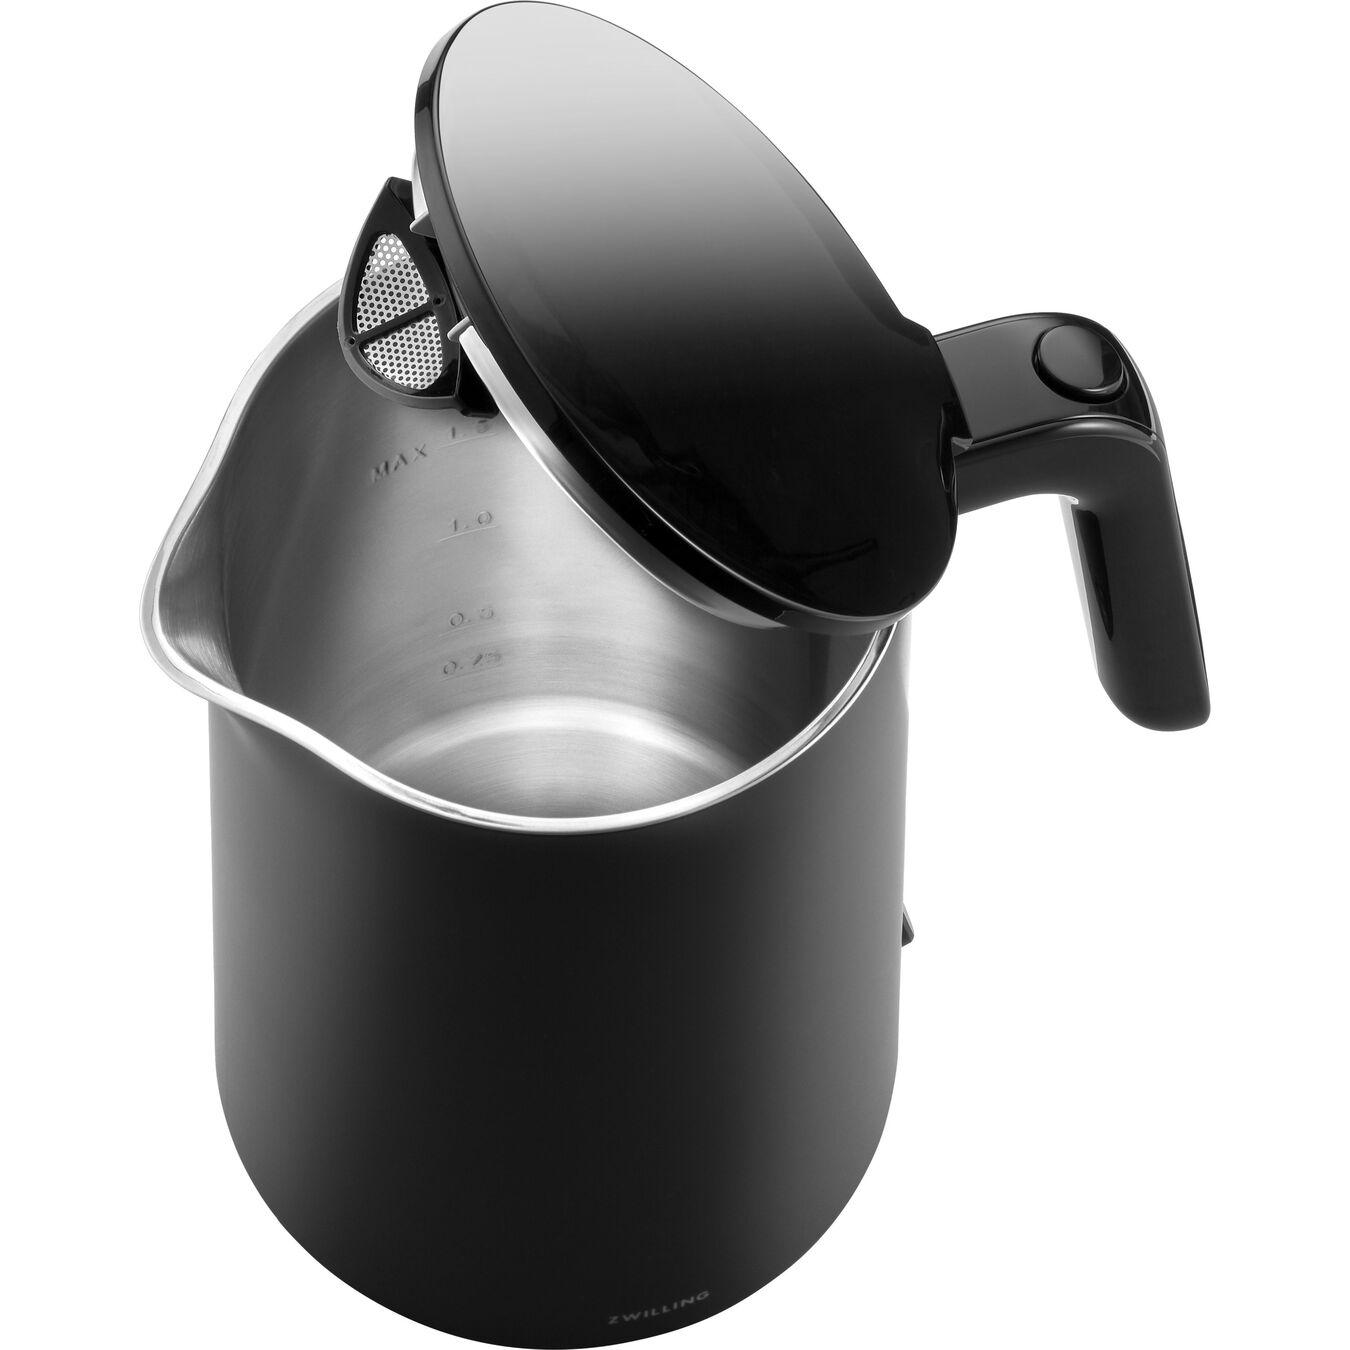 Wasserkocher, 1,5 l, Schwarz,,large 5